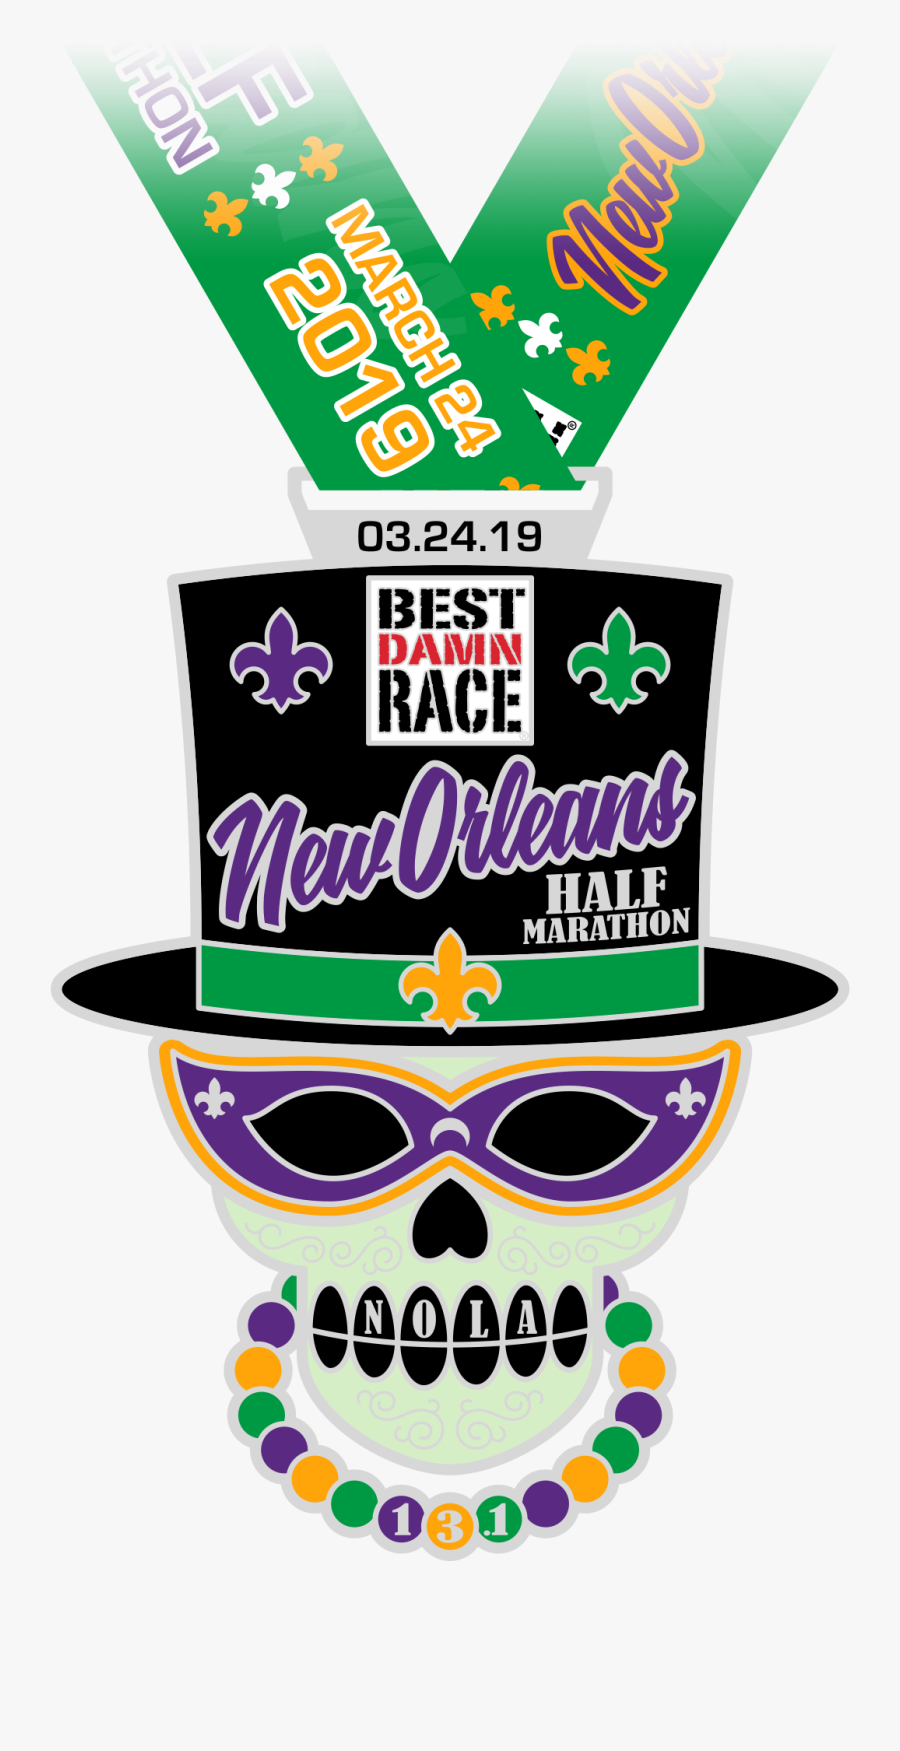 Half Marathon Medal - Best Damn Race New Orleans Medal, Transparent Clipart